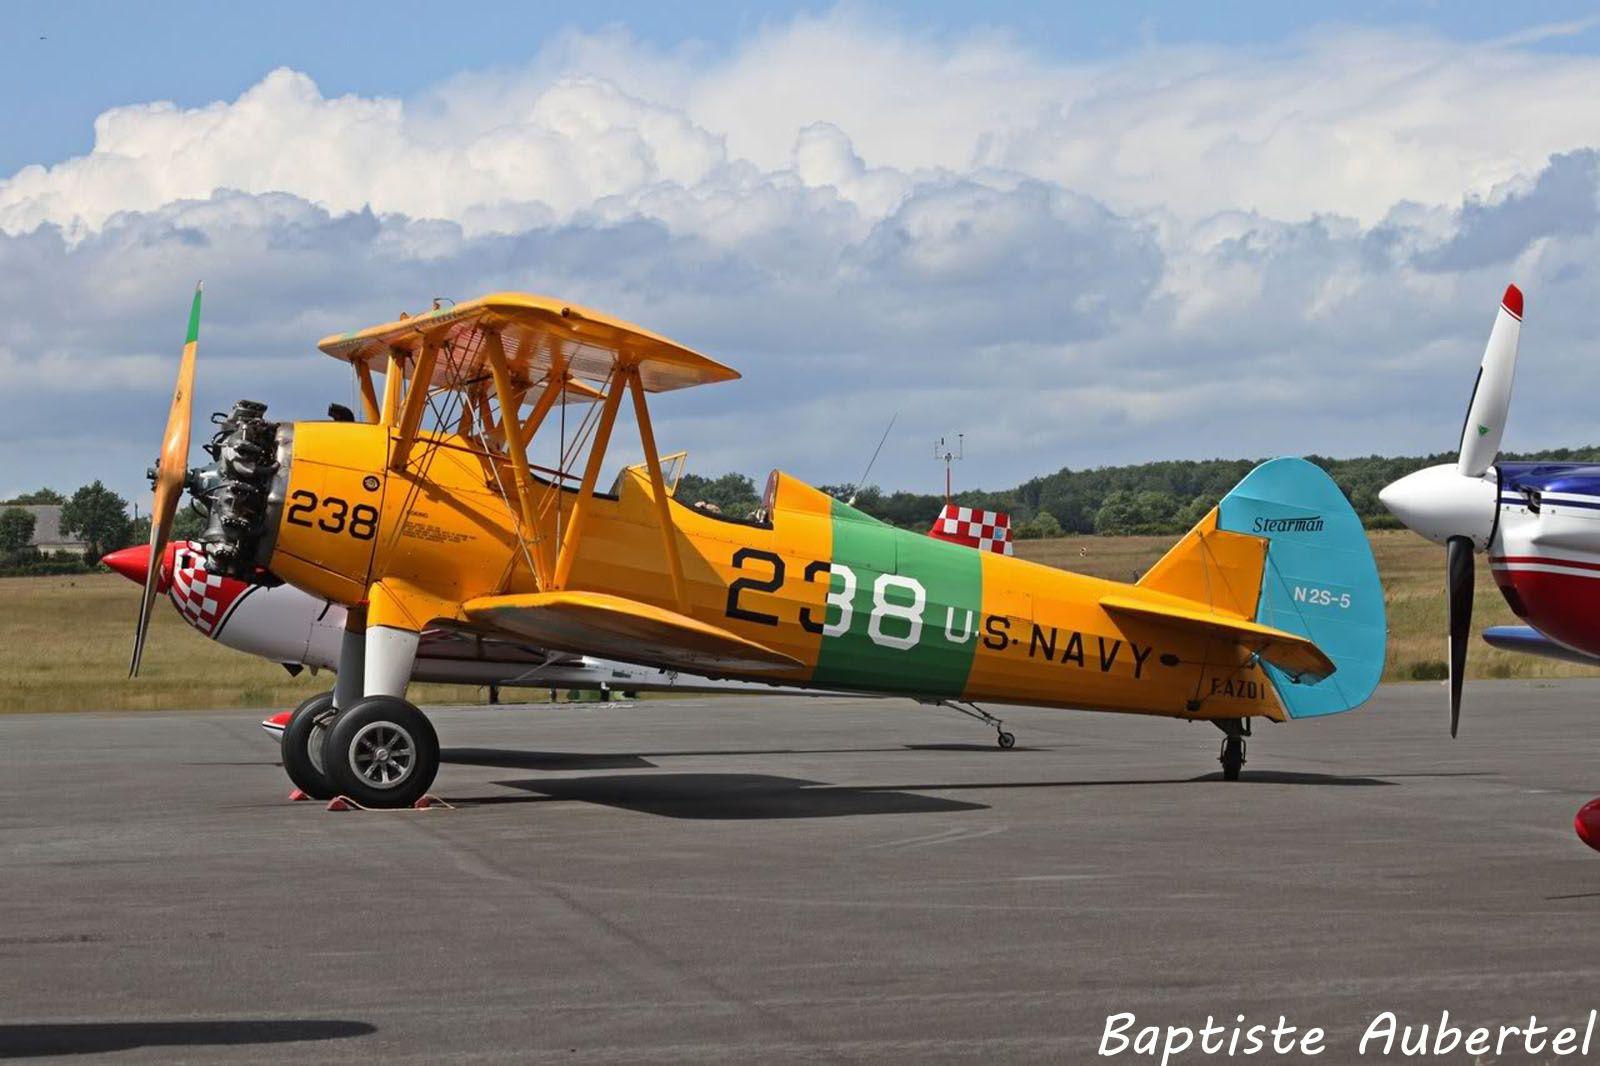 Le Boeing Steraman F-AZDI (photo Baptiste Aubertel)